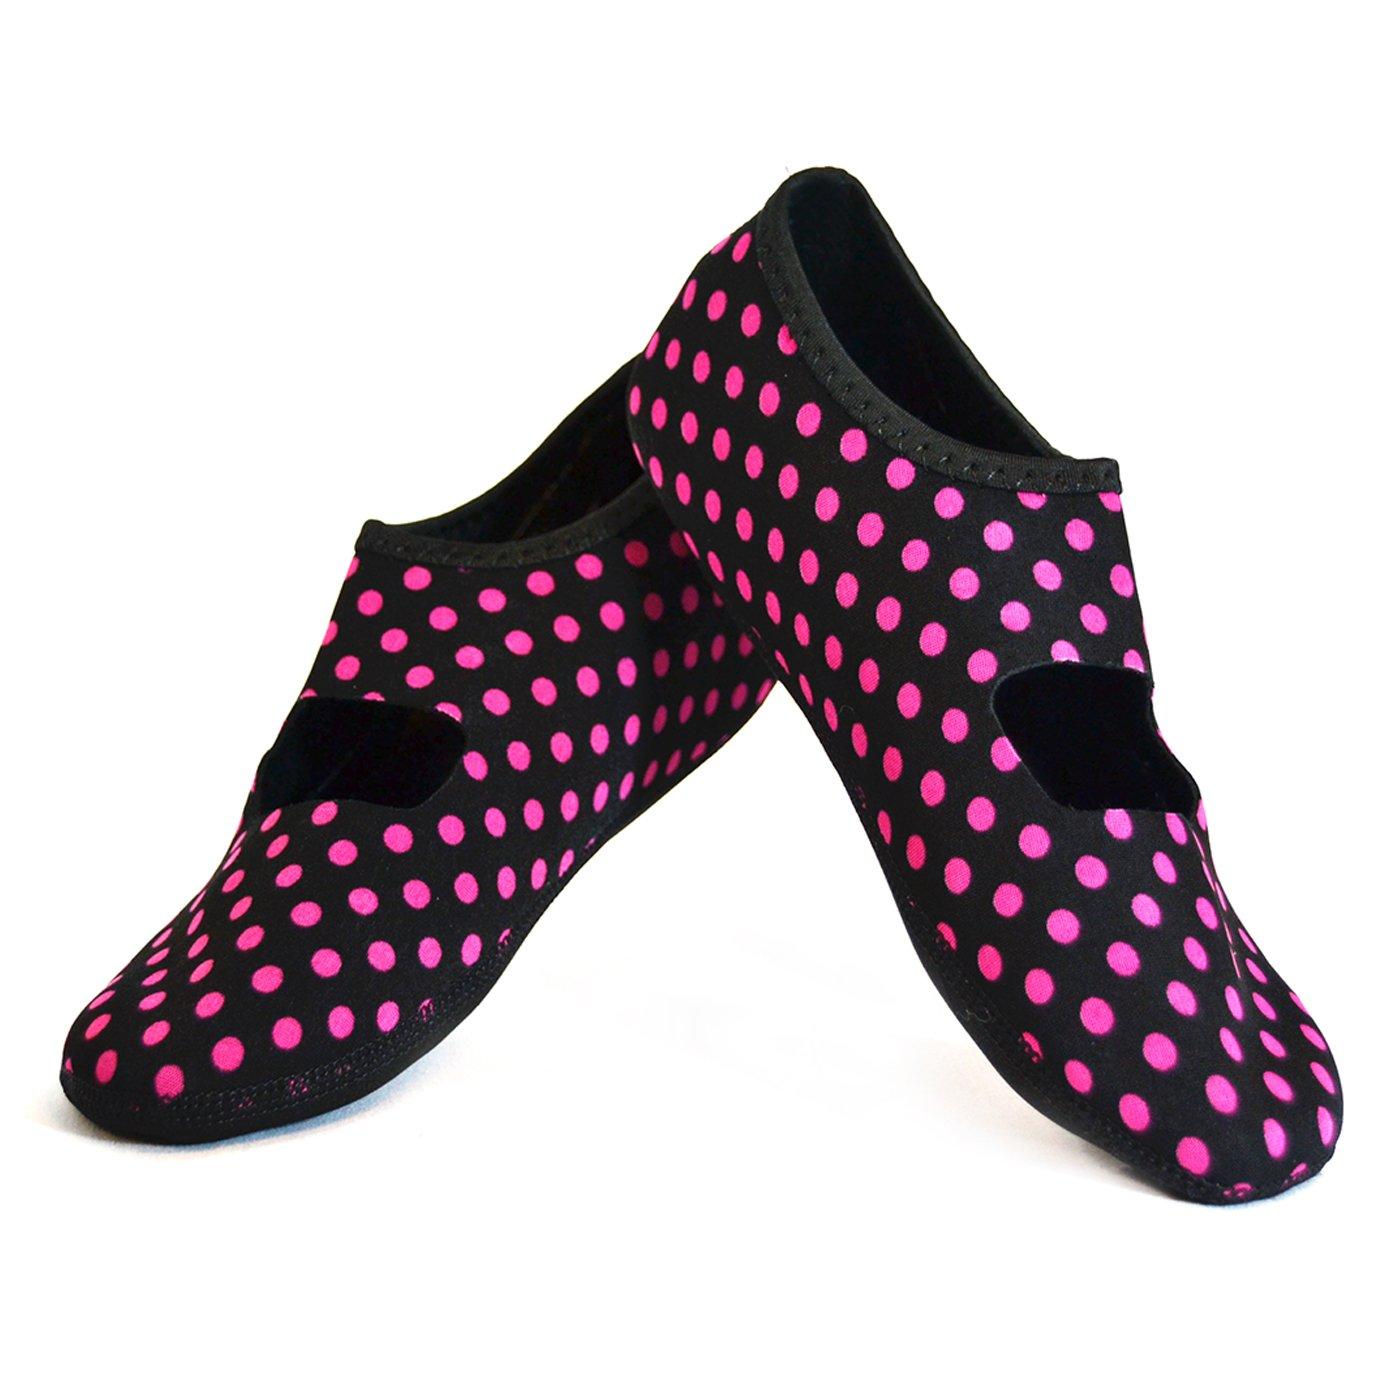 NuFoot Mary Janes Women's Shoes, Best Foldable & Flexible Flats, Slipper Socks, Travel Slippers & Exercise Shoes, Dance Shoes, Yoga Socks, House Shoes, Indoor Slippers, Black/Pink Polka Dots, Medium